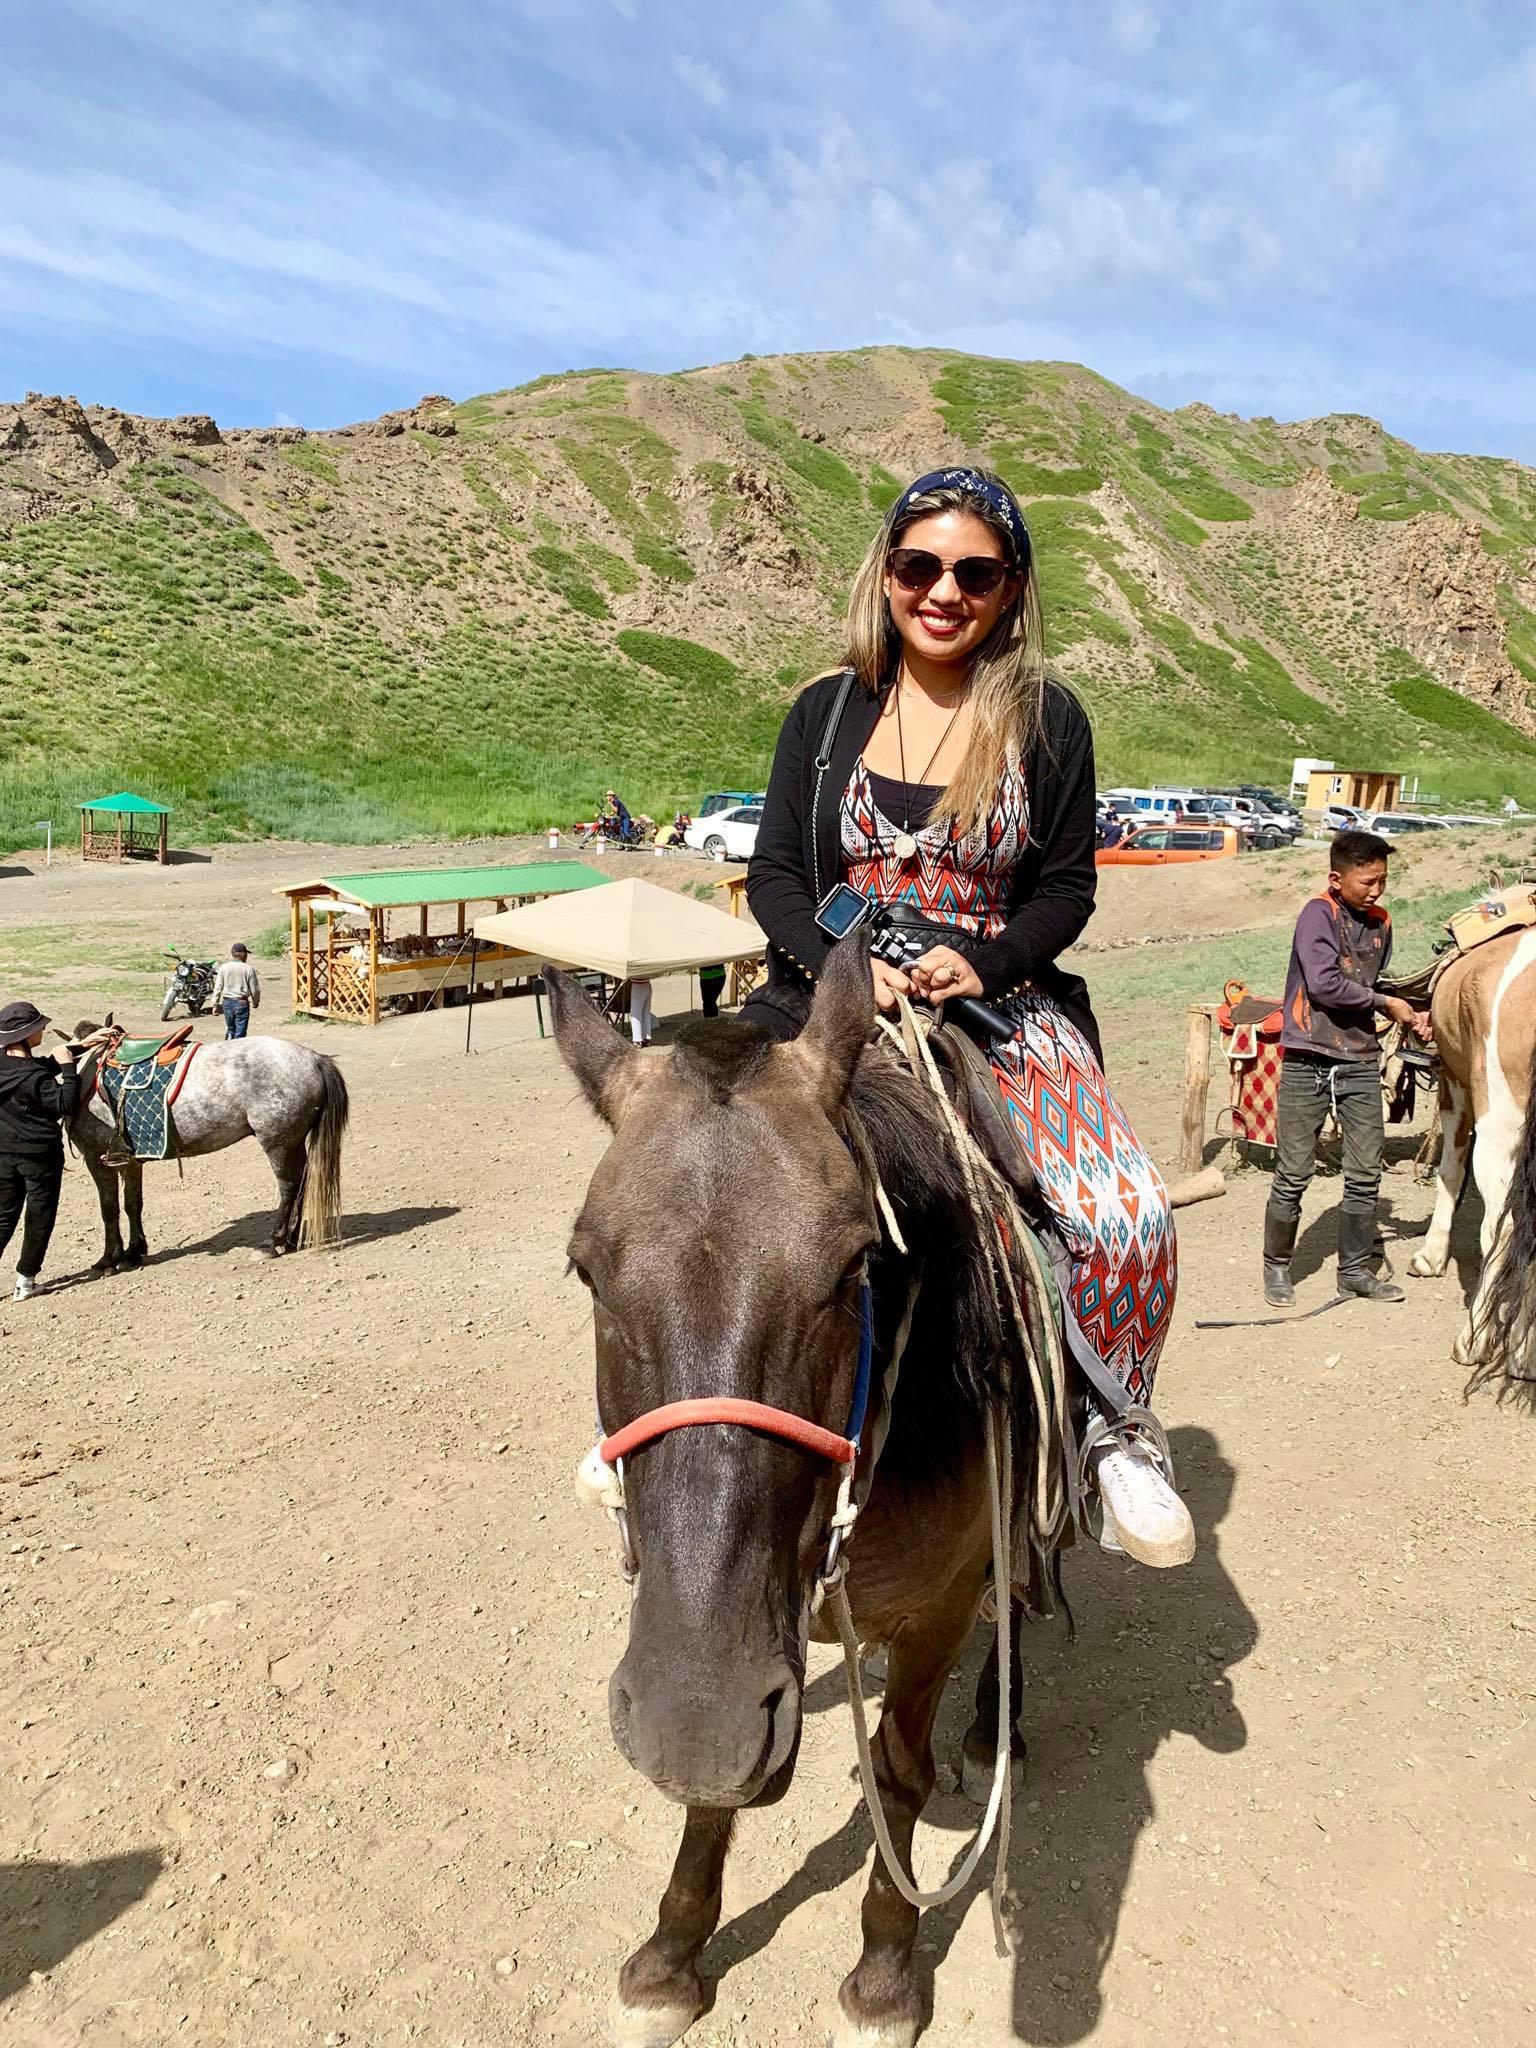 Kach Solo Travels in 2019 Horseback riding trip to the Gobi Gurvan Saikhan National Park5.jpg